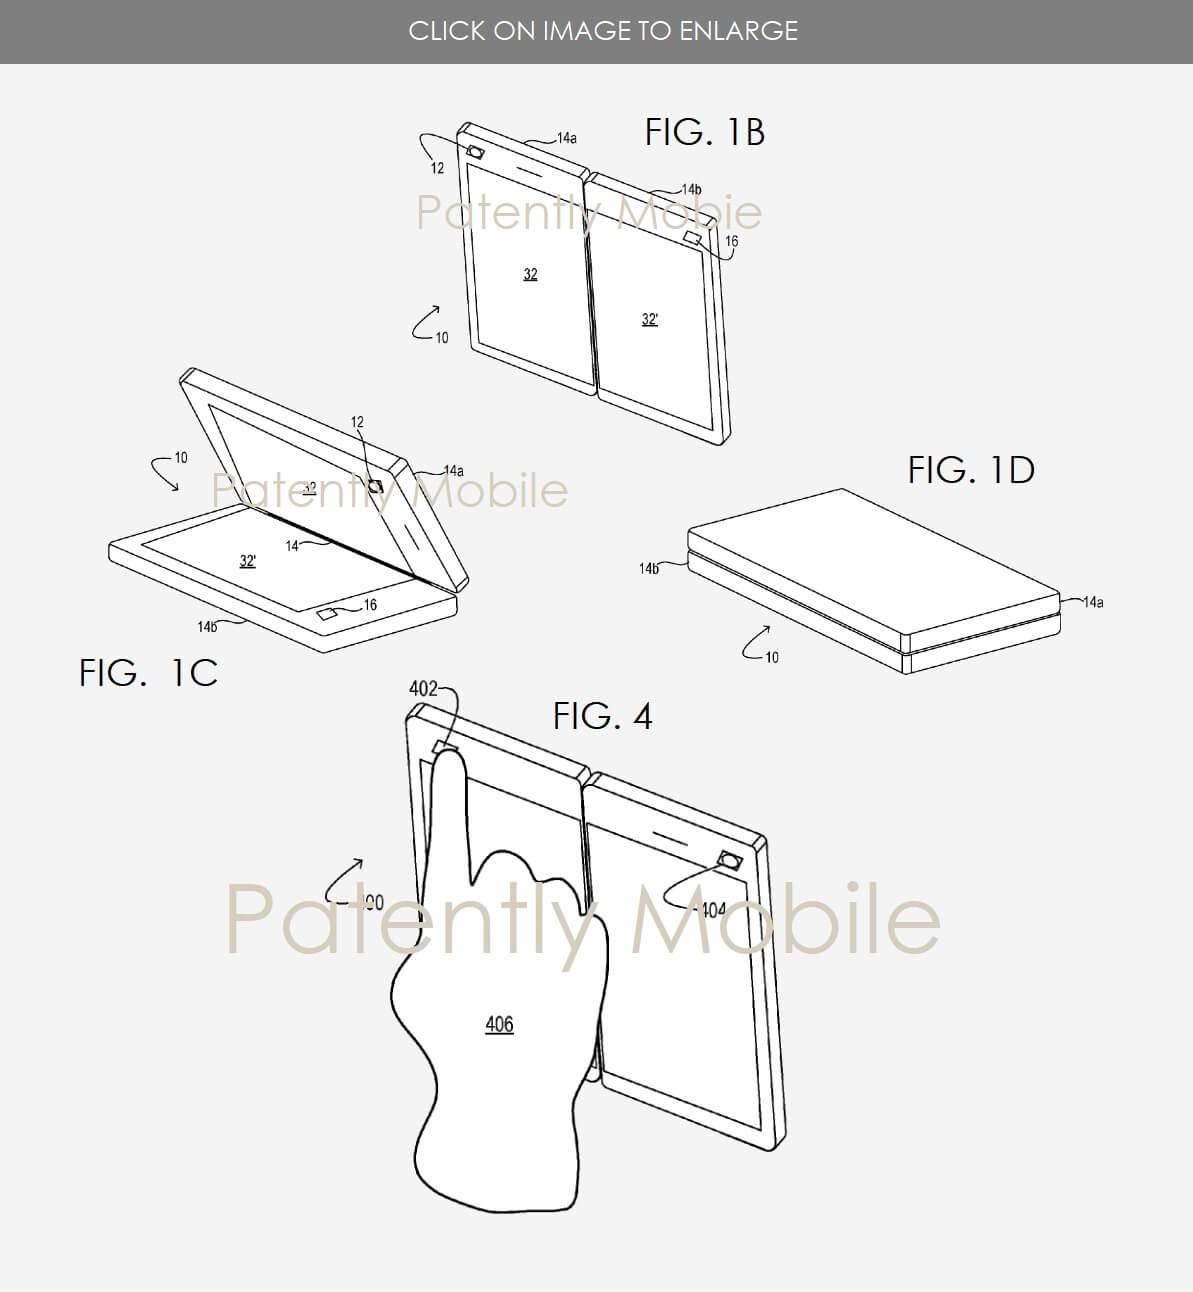 Microsoft's foldable display patent